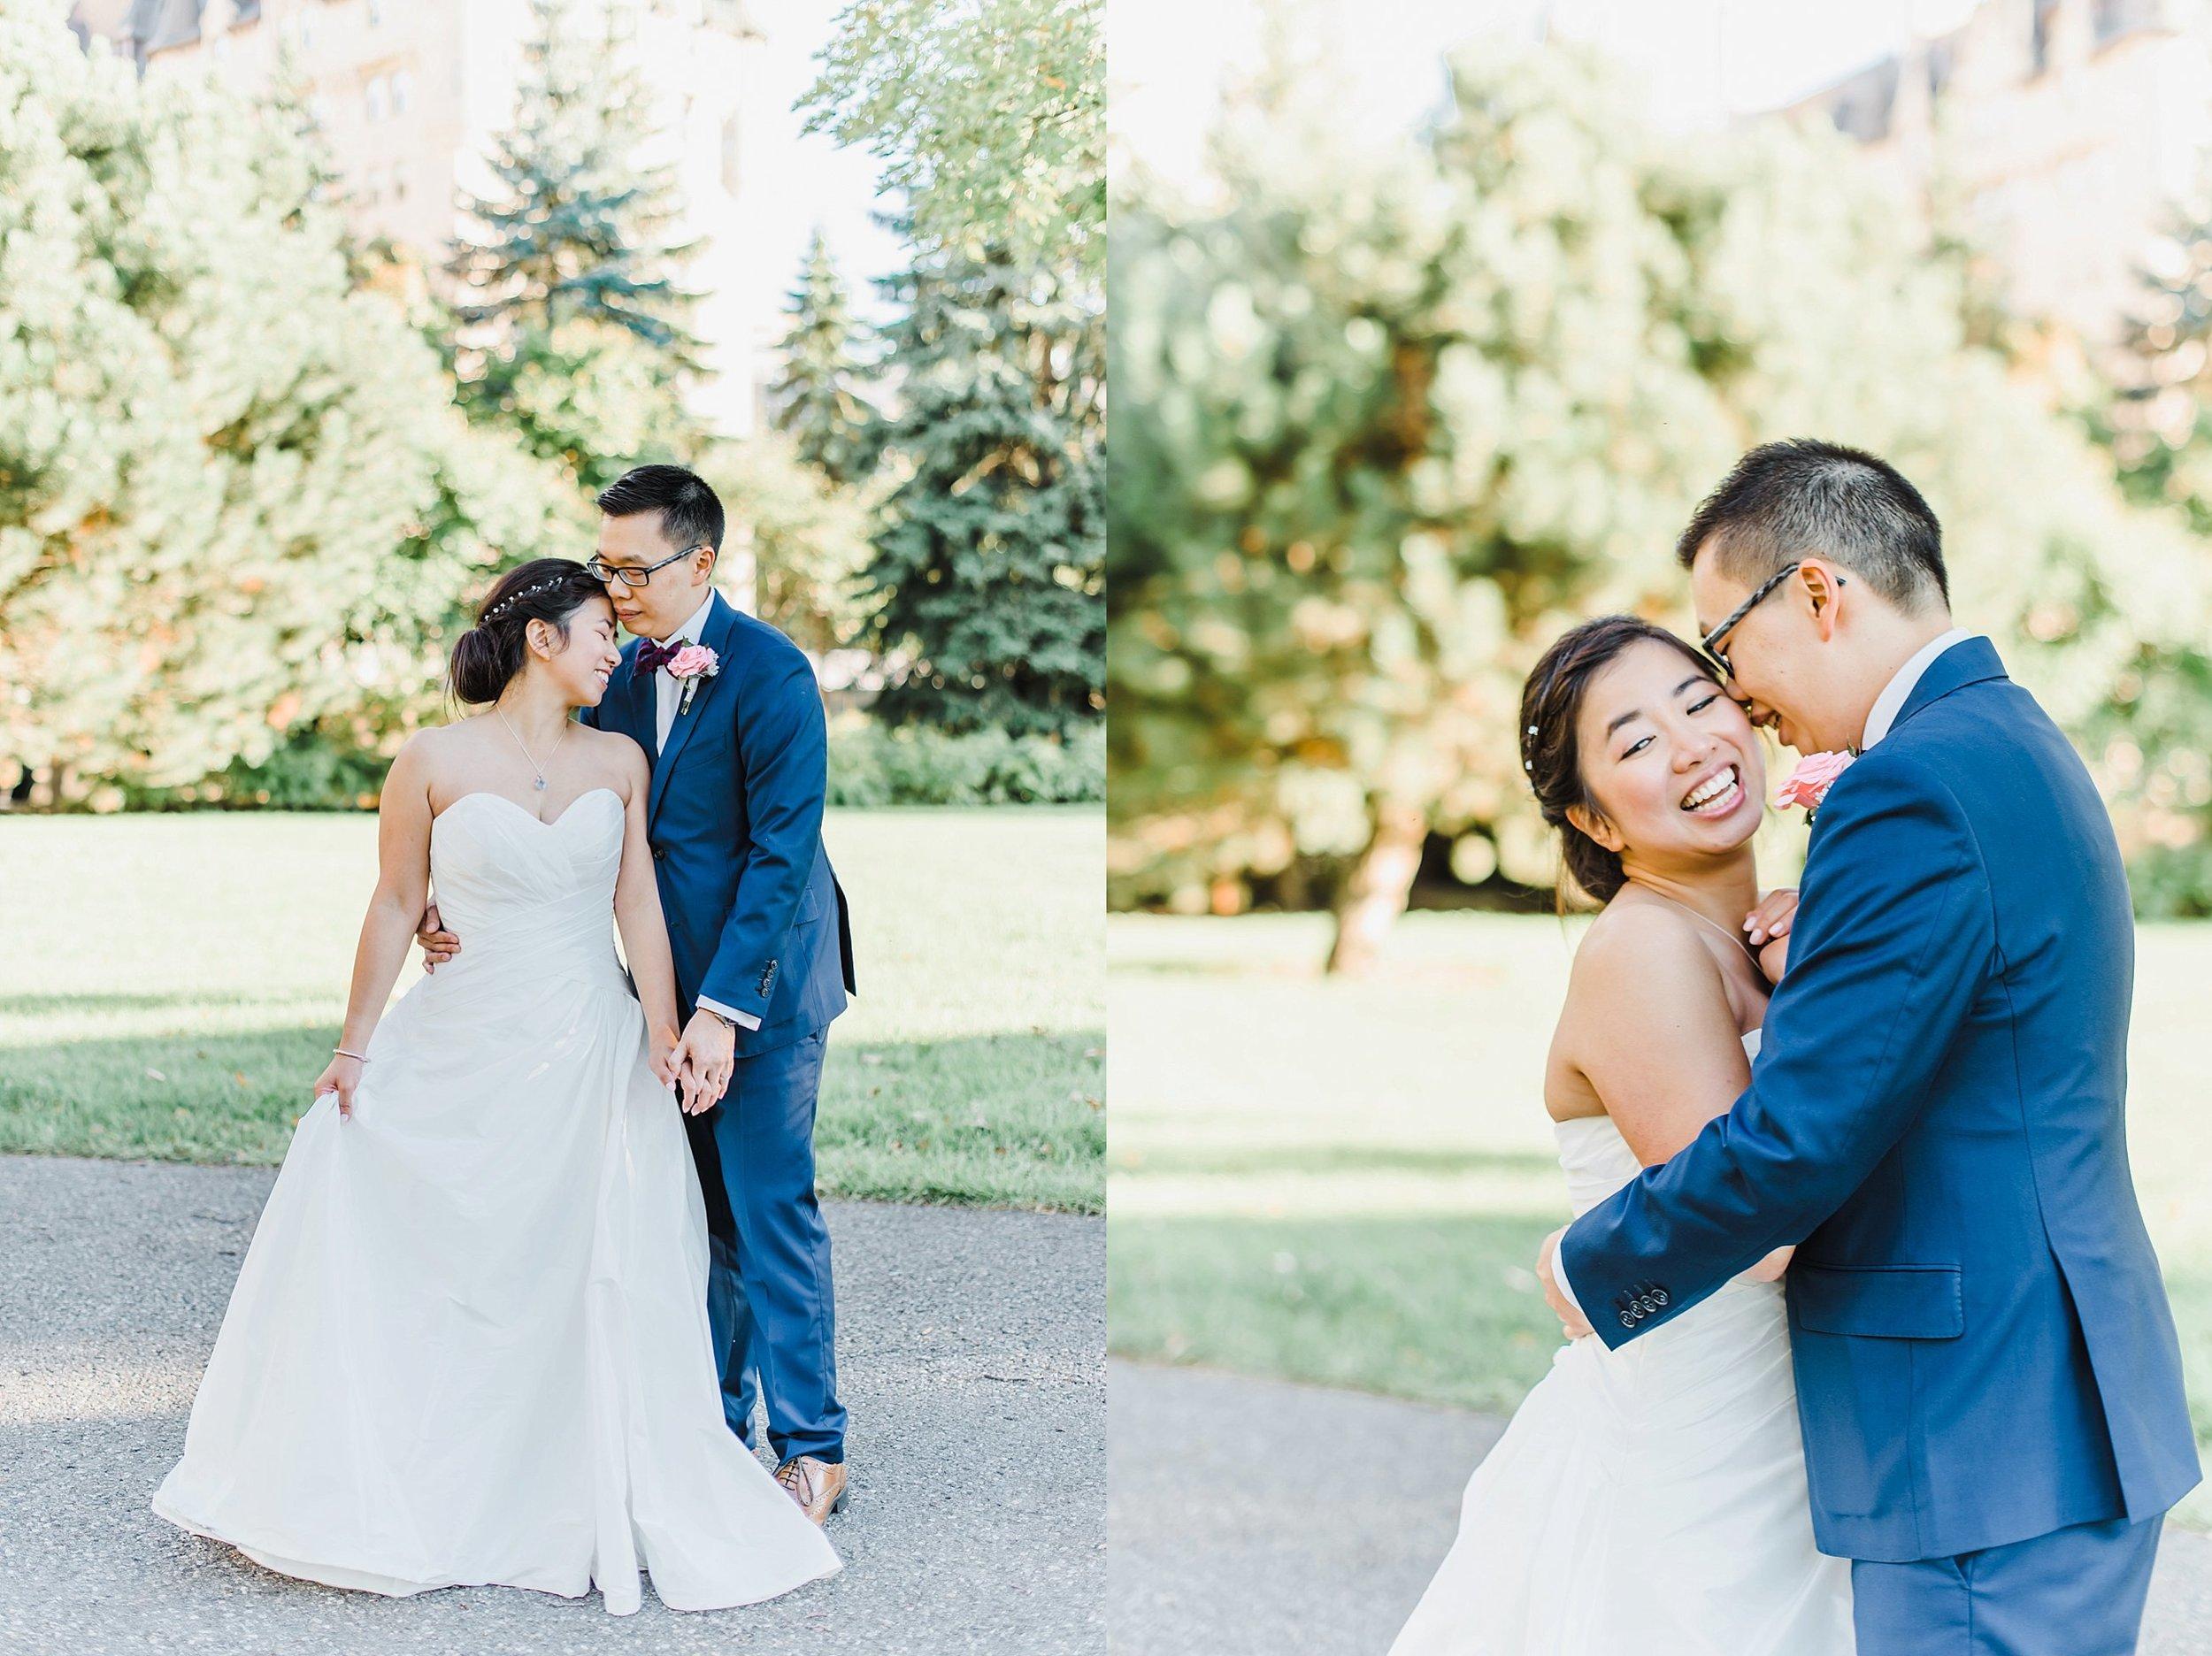 light airy indie fine art ottawa wedding photographer | Ali and Batoul Photography_1547.jpg